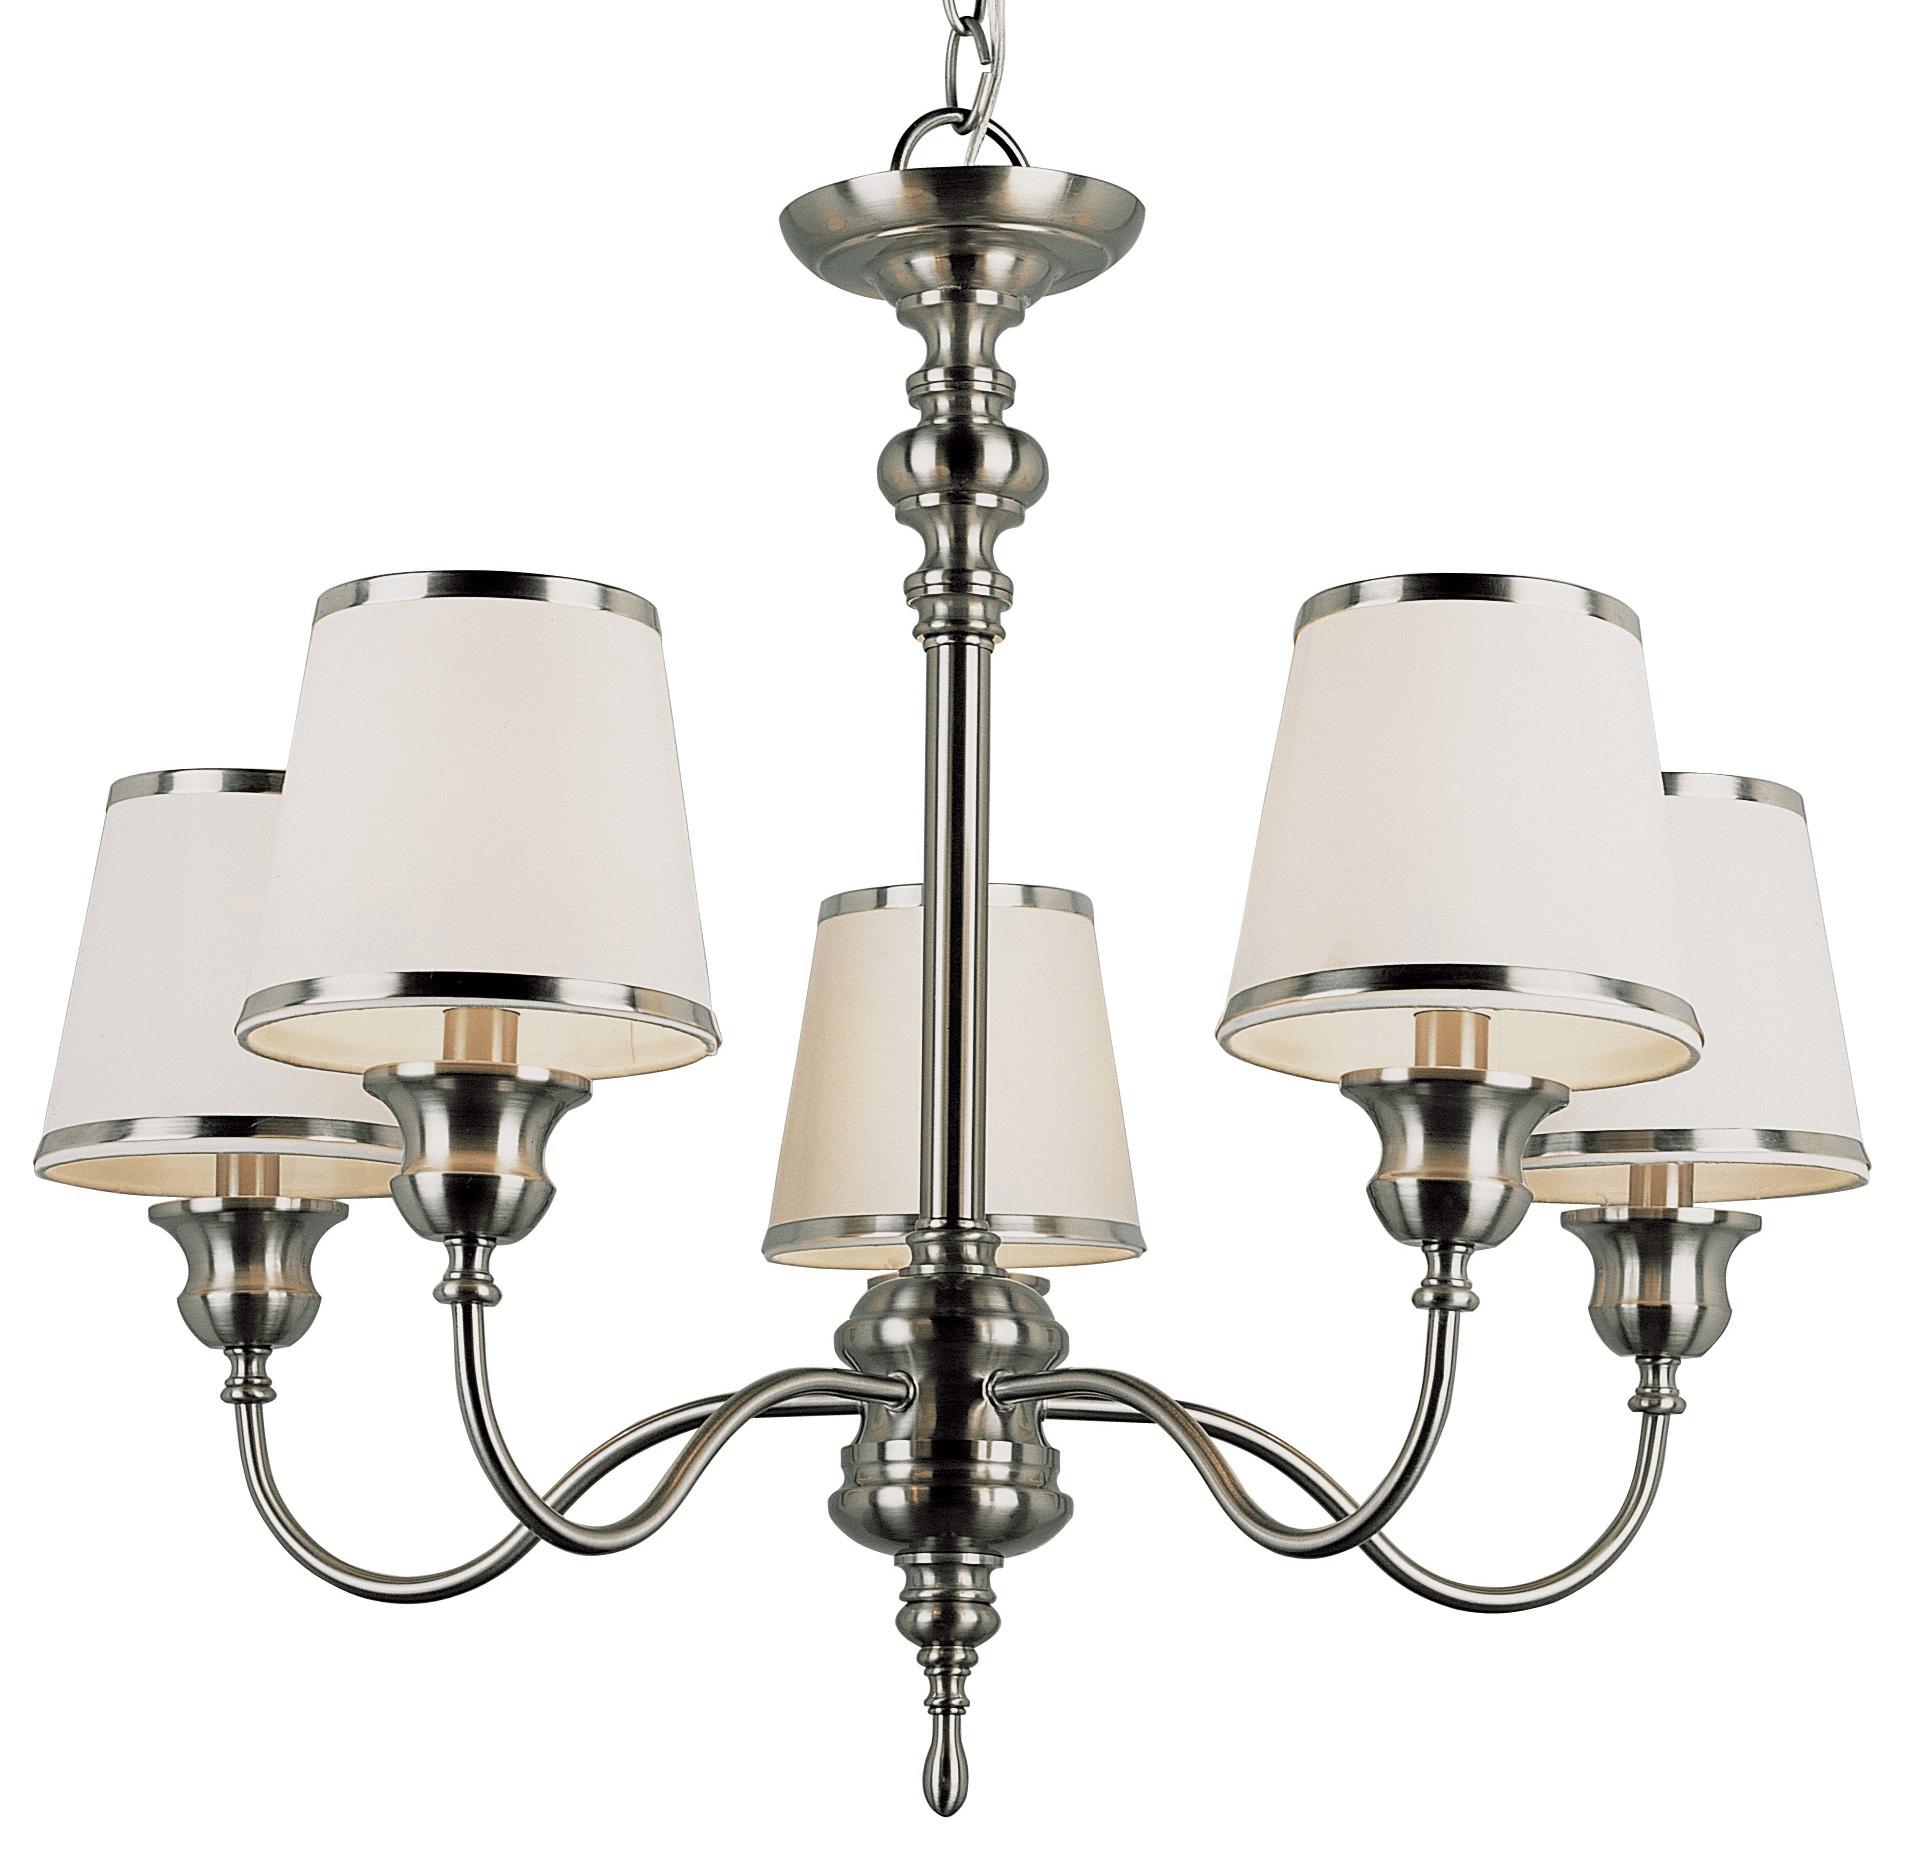 White plug in chandelier